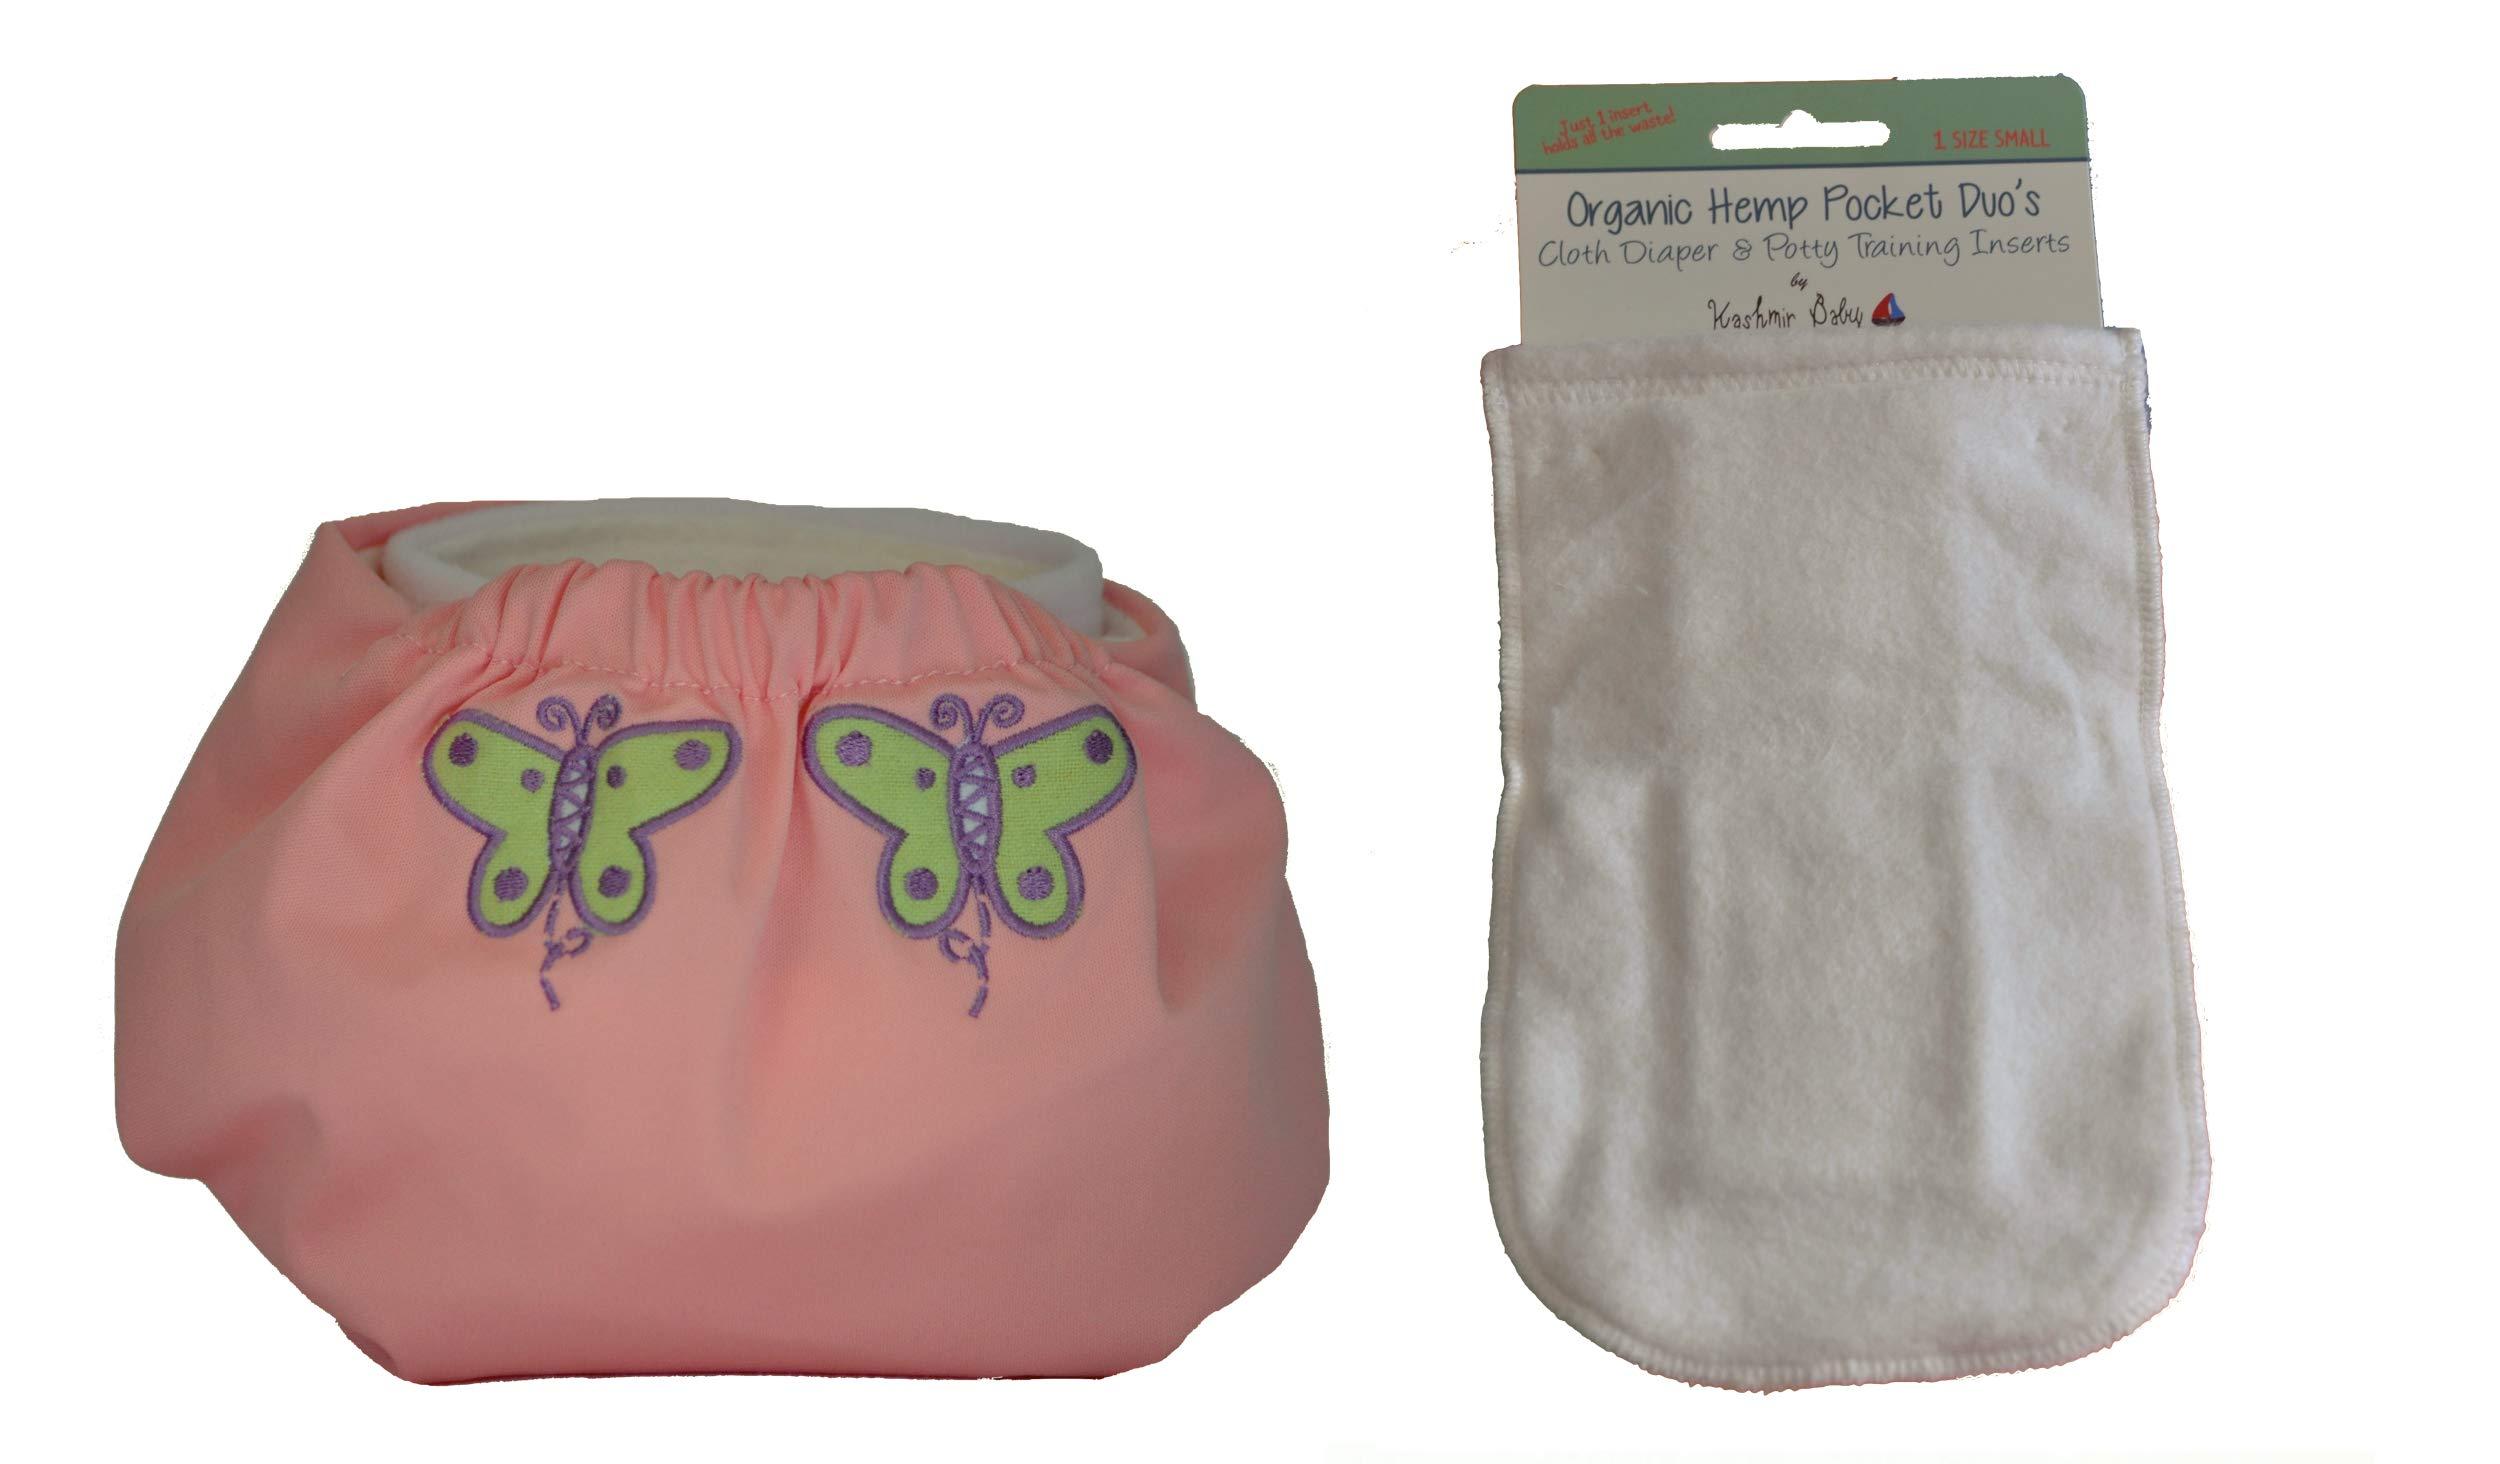 Kashmir Baby Hemp/Organic One Size Diaper, Hemp Insert (Butterfly Kiss) by Kashmir Baby